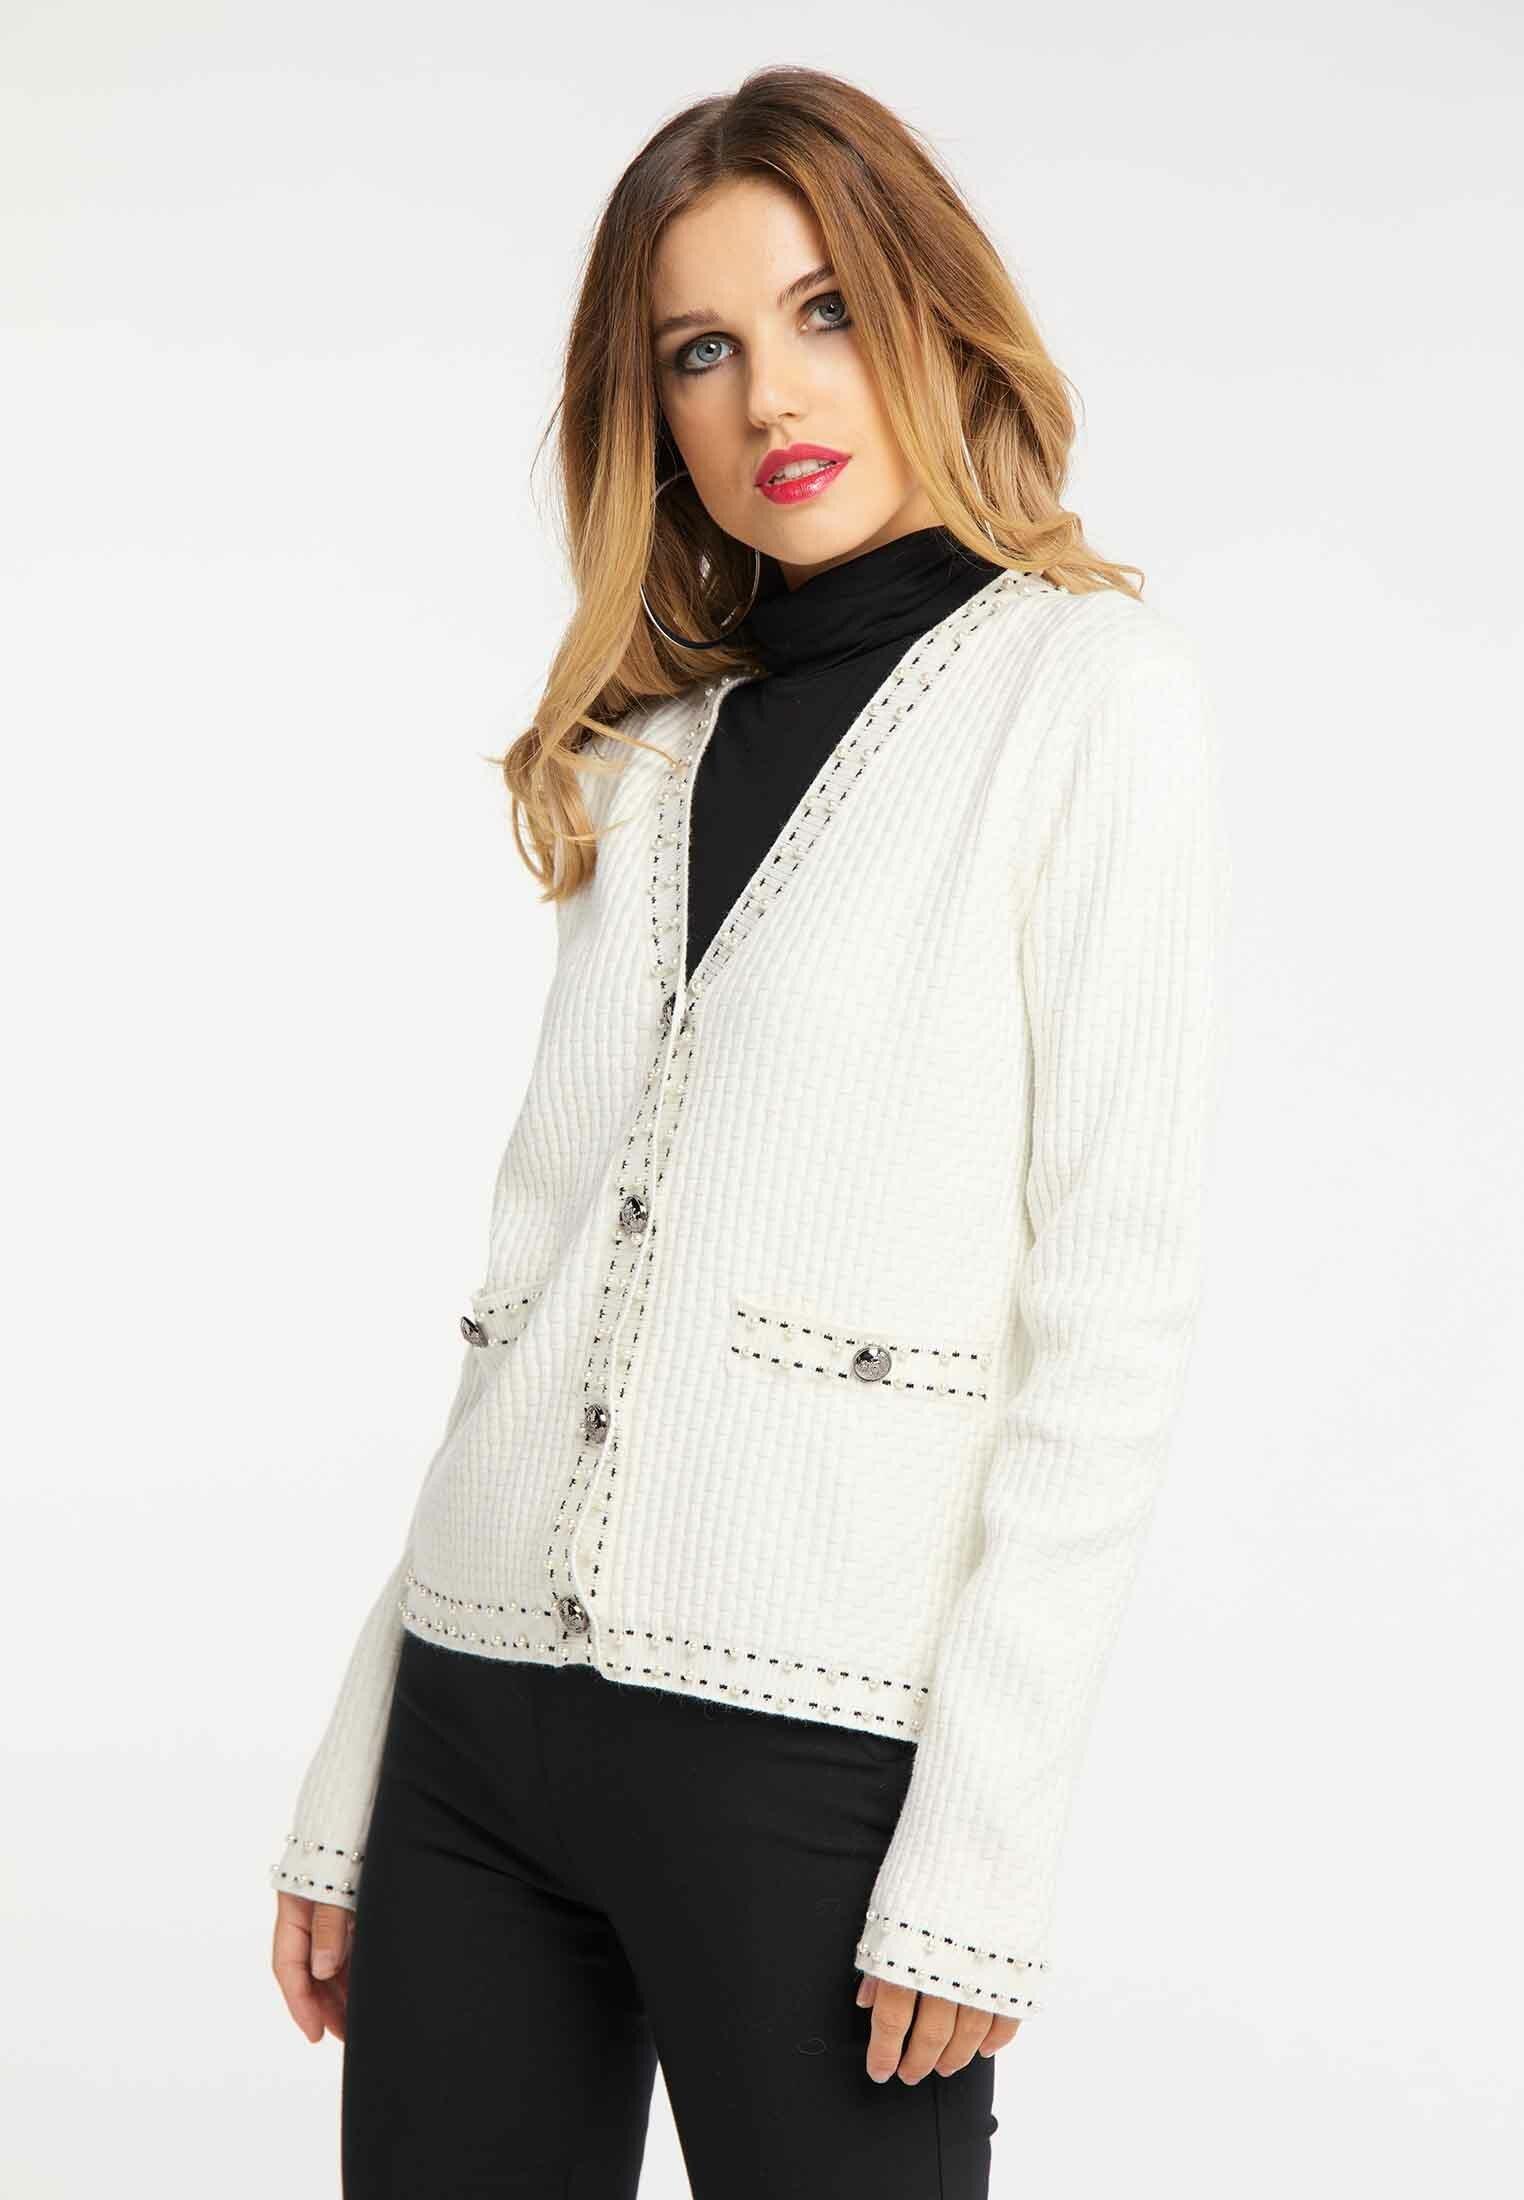 Discount Women's Clothing faina Cardigan white KV8tWPet5